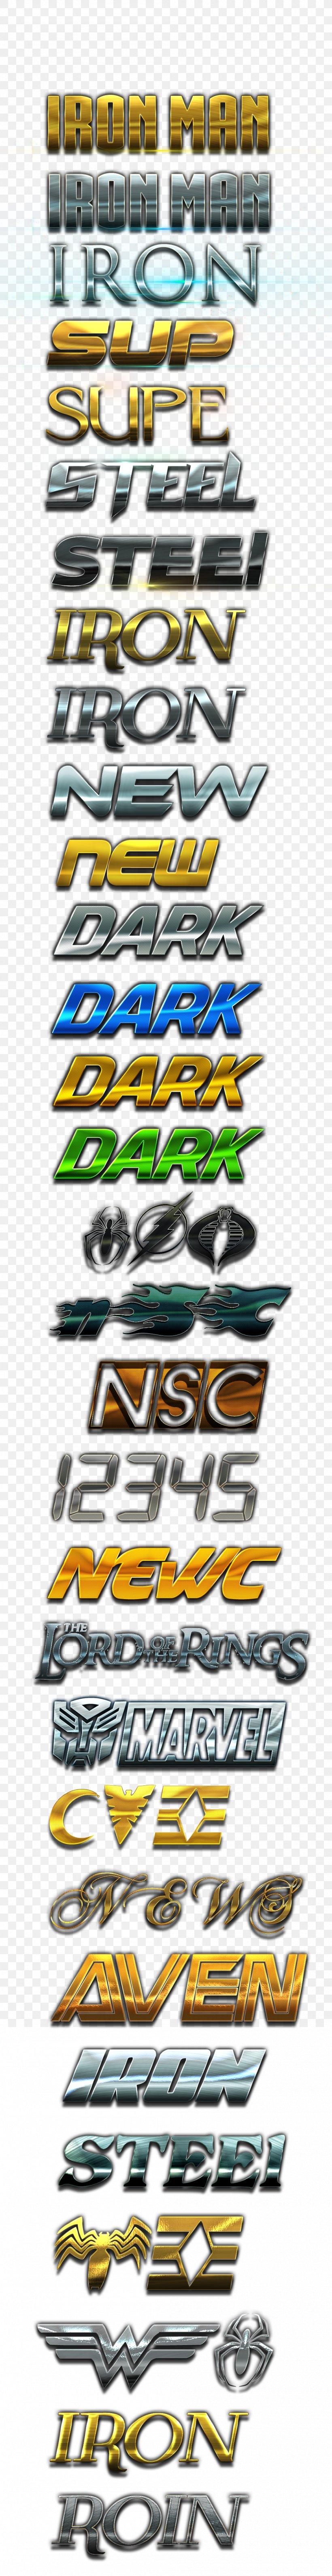 Metal Typeface Font, PNG, 1000x7749px, Metal, Art, Google Images, Letter, Pattern Download Free